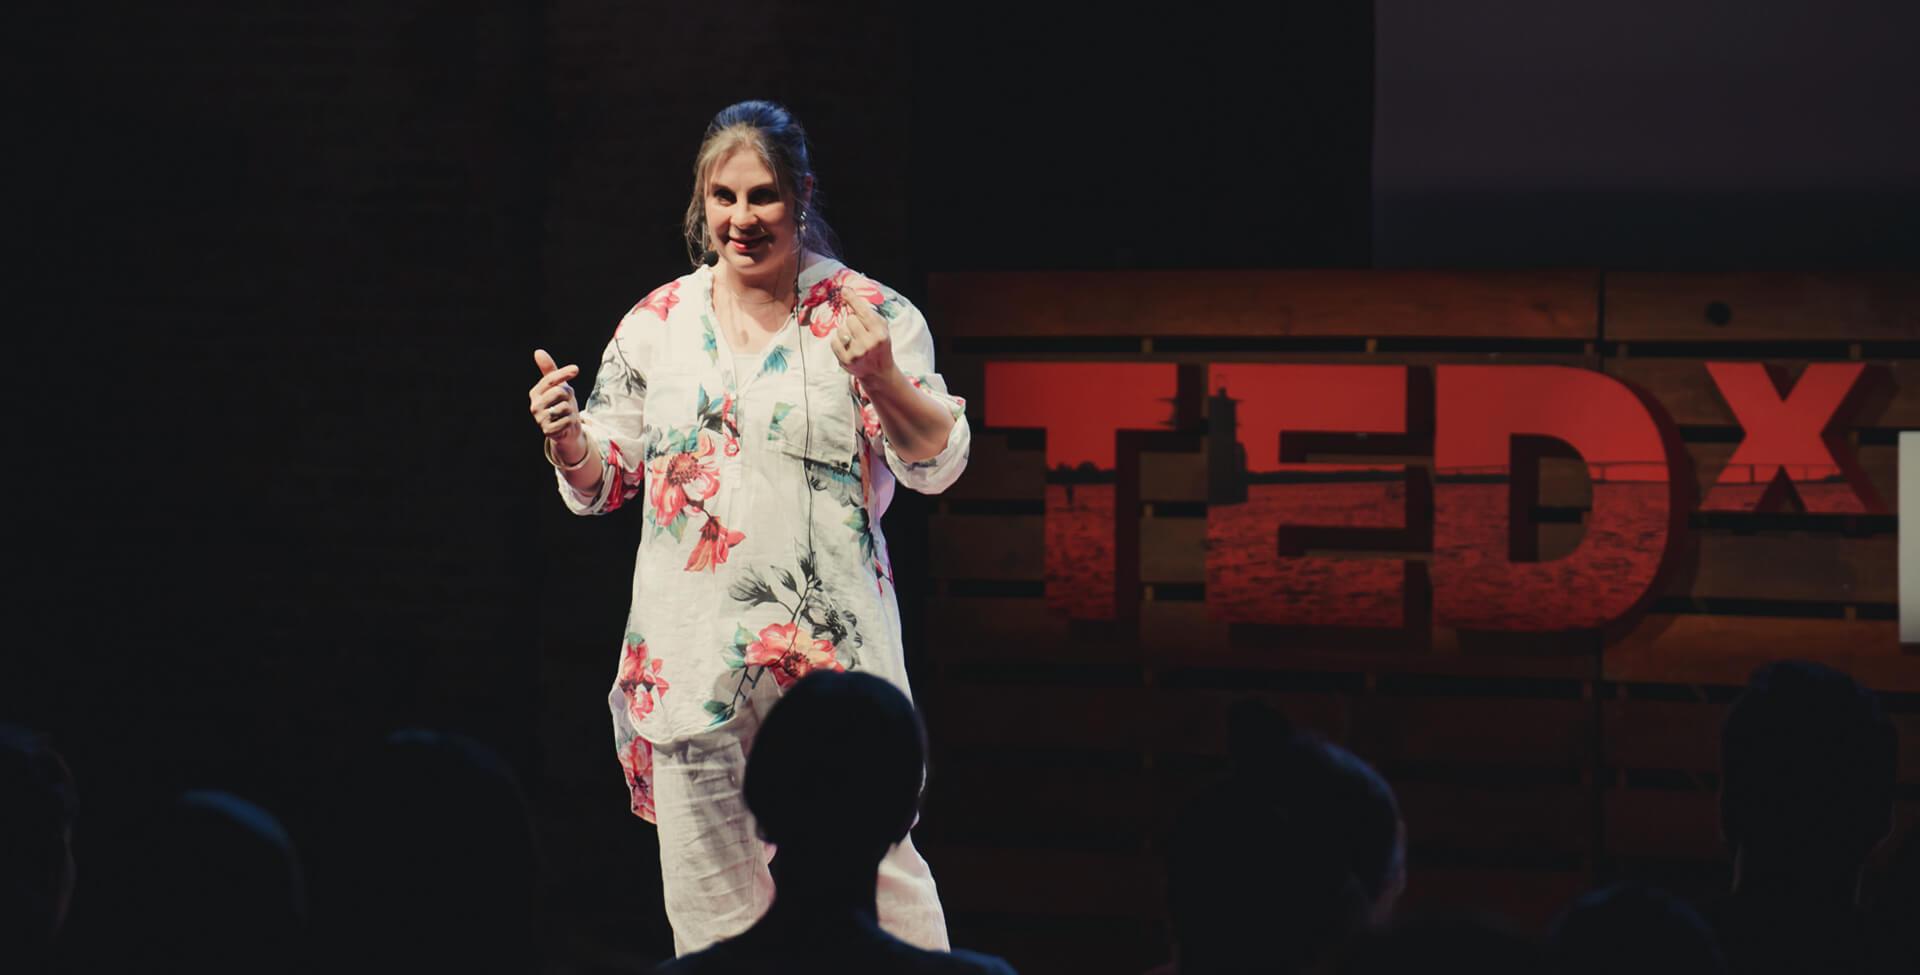 Laura Galin speaking in TEDx Paysandú